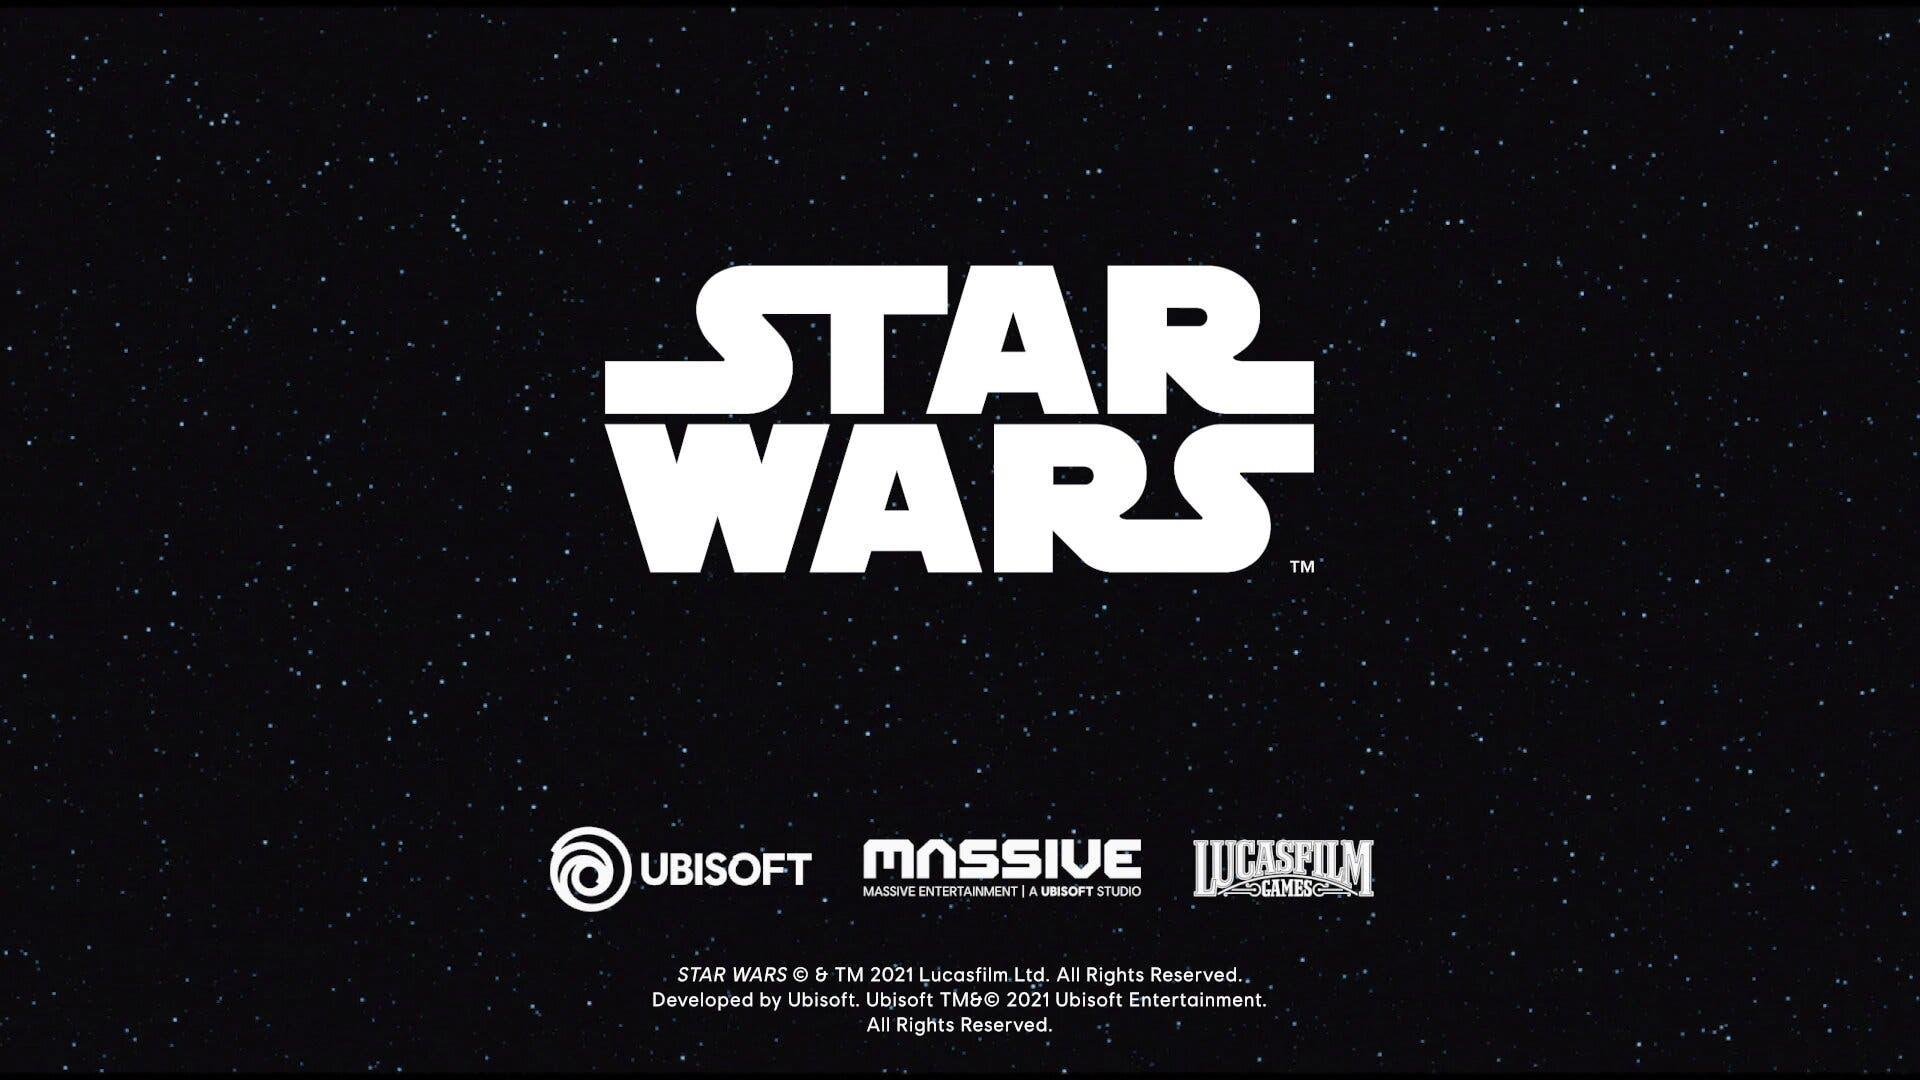 juego de Star Wars de Ubisoft